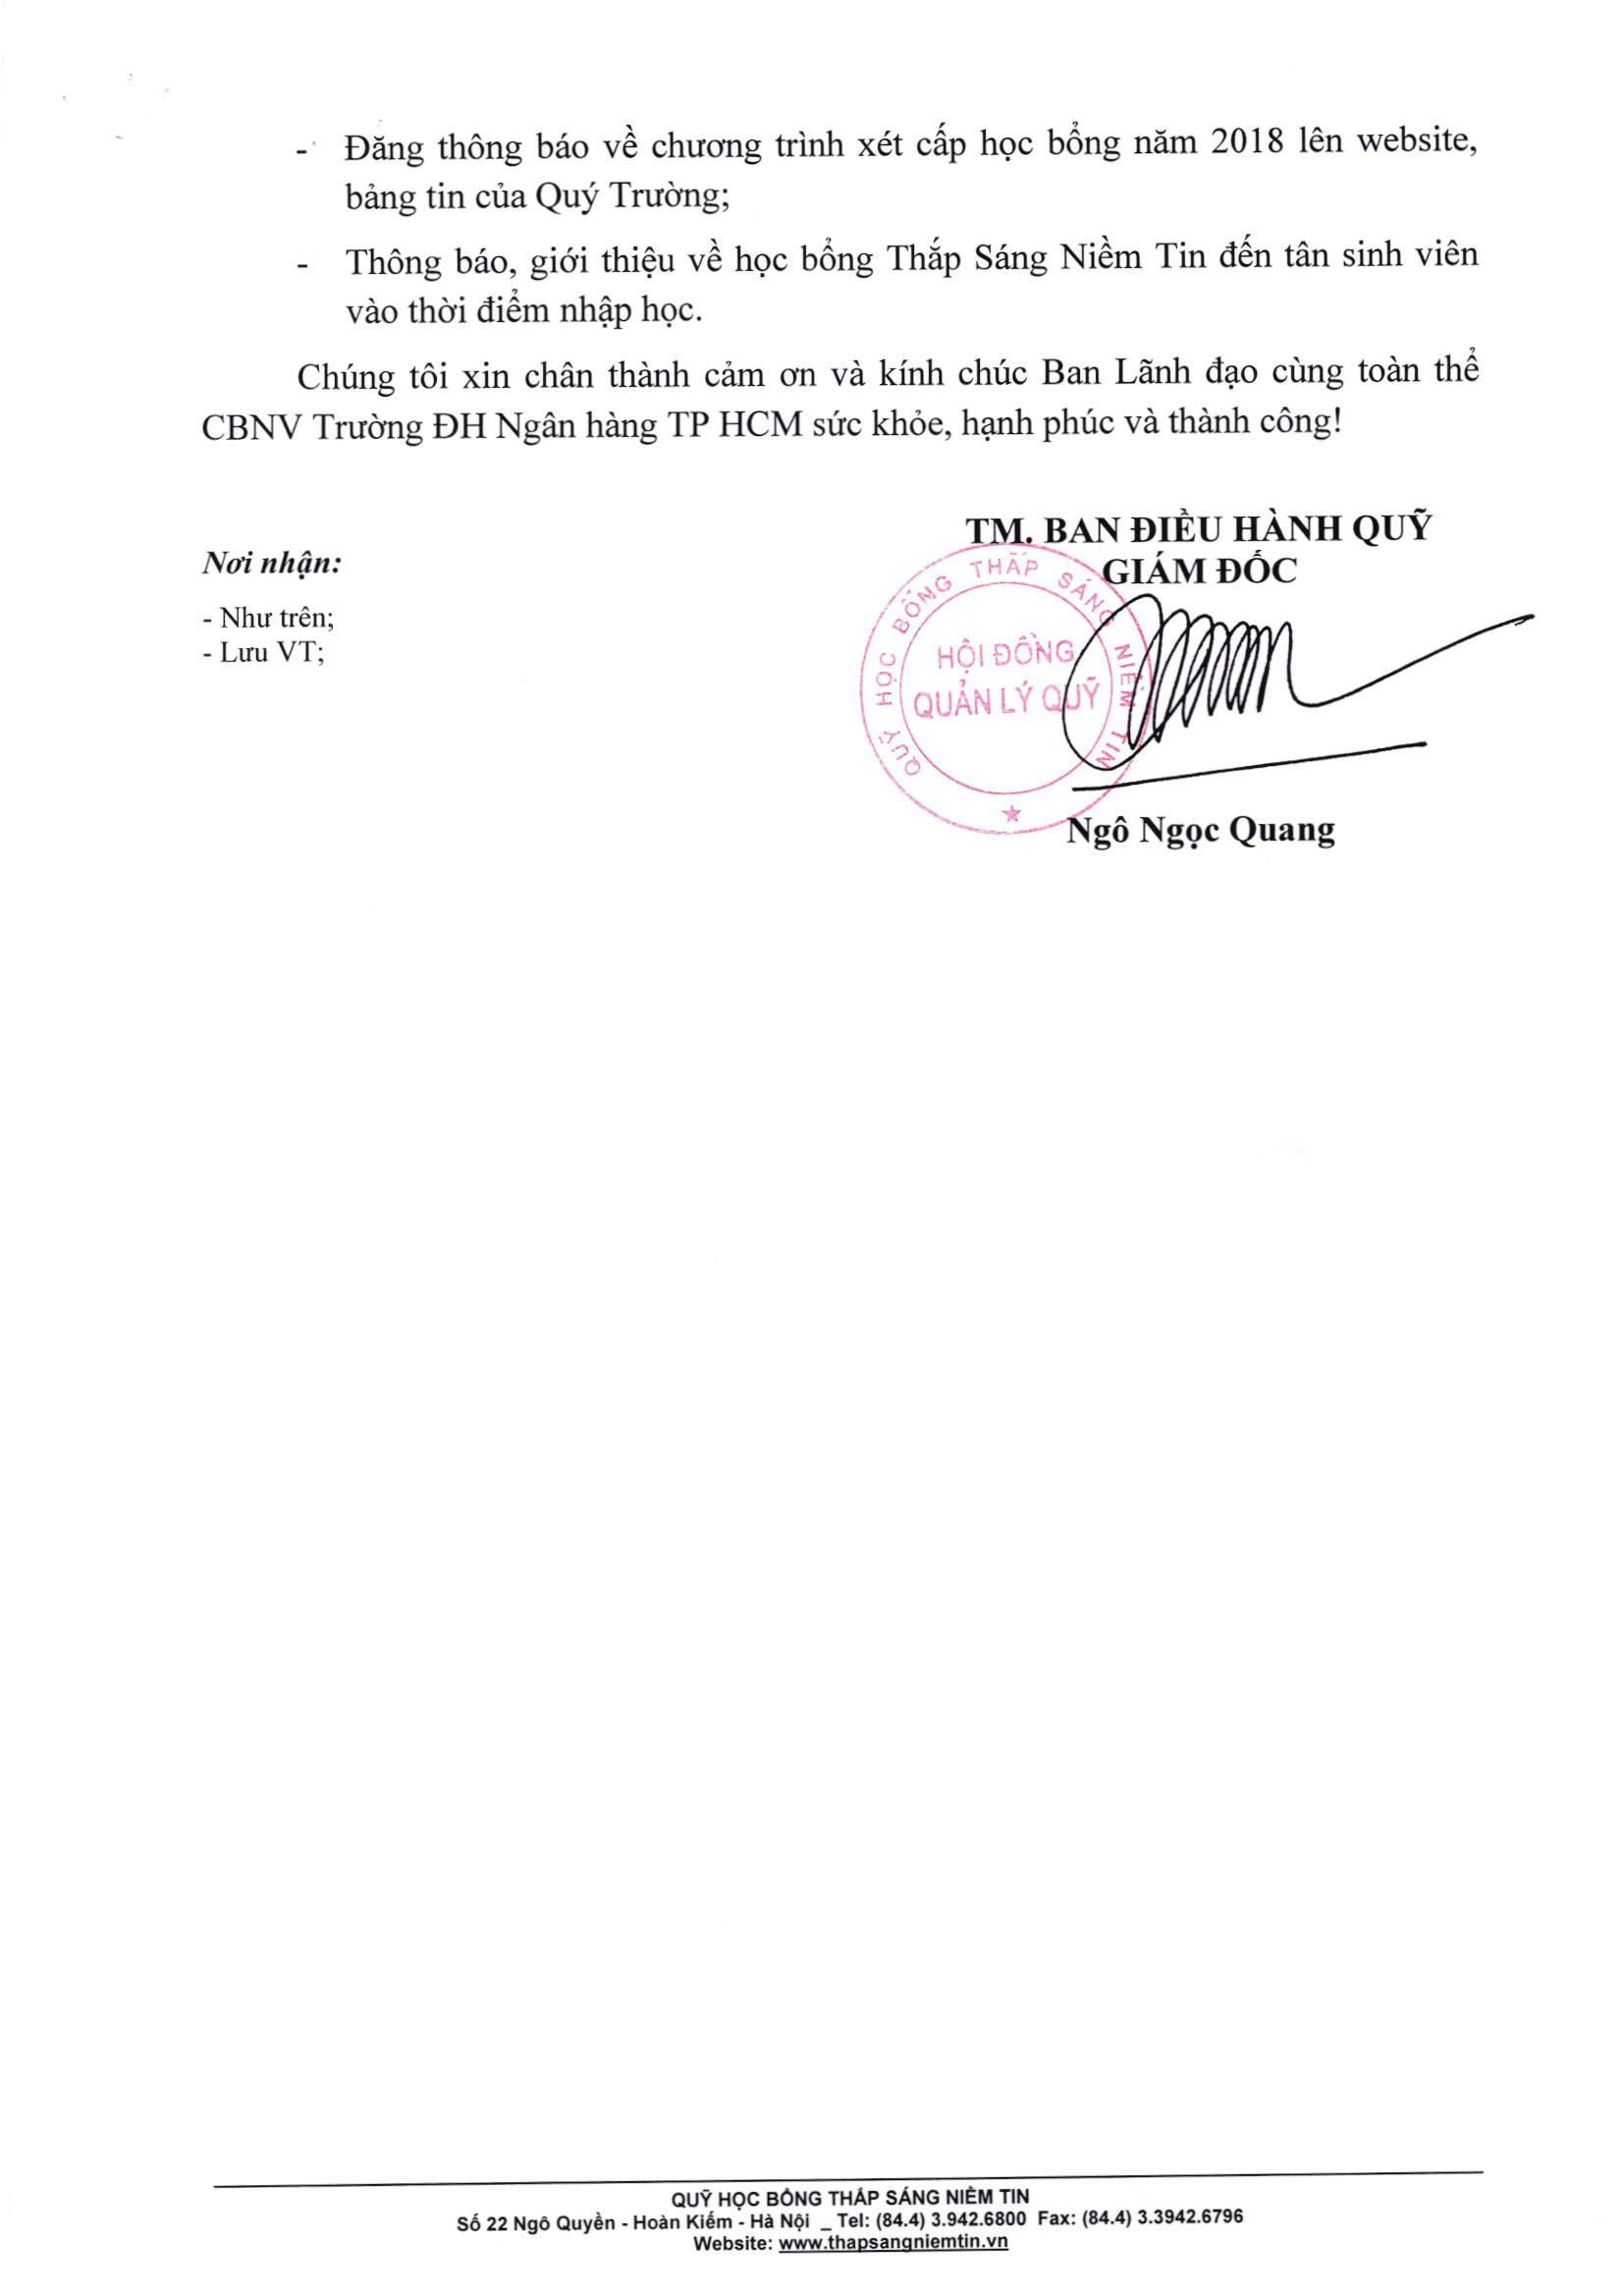 29.18-Hoc bong 2018-Quy hoc bong thap sang niem tin_Page_3